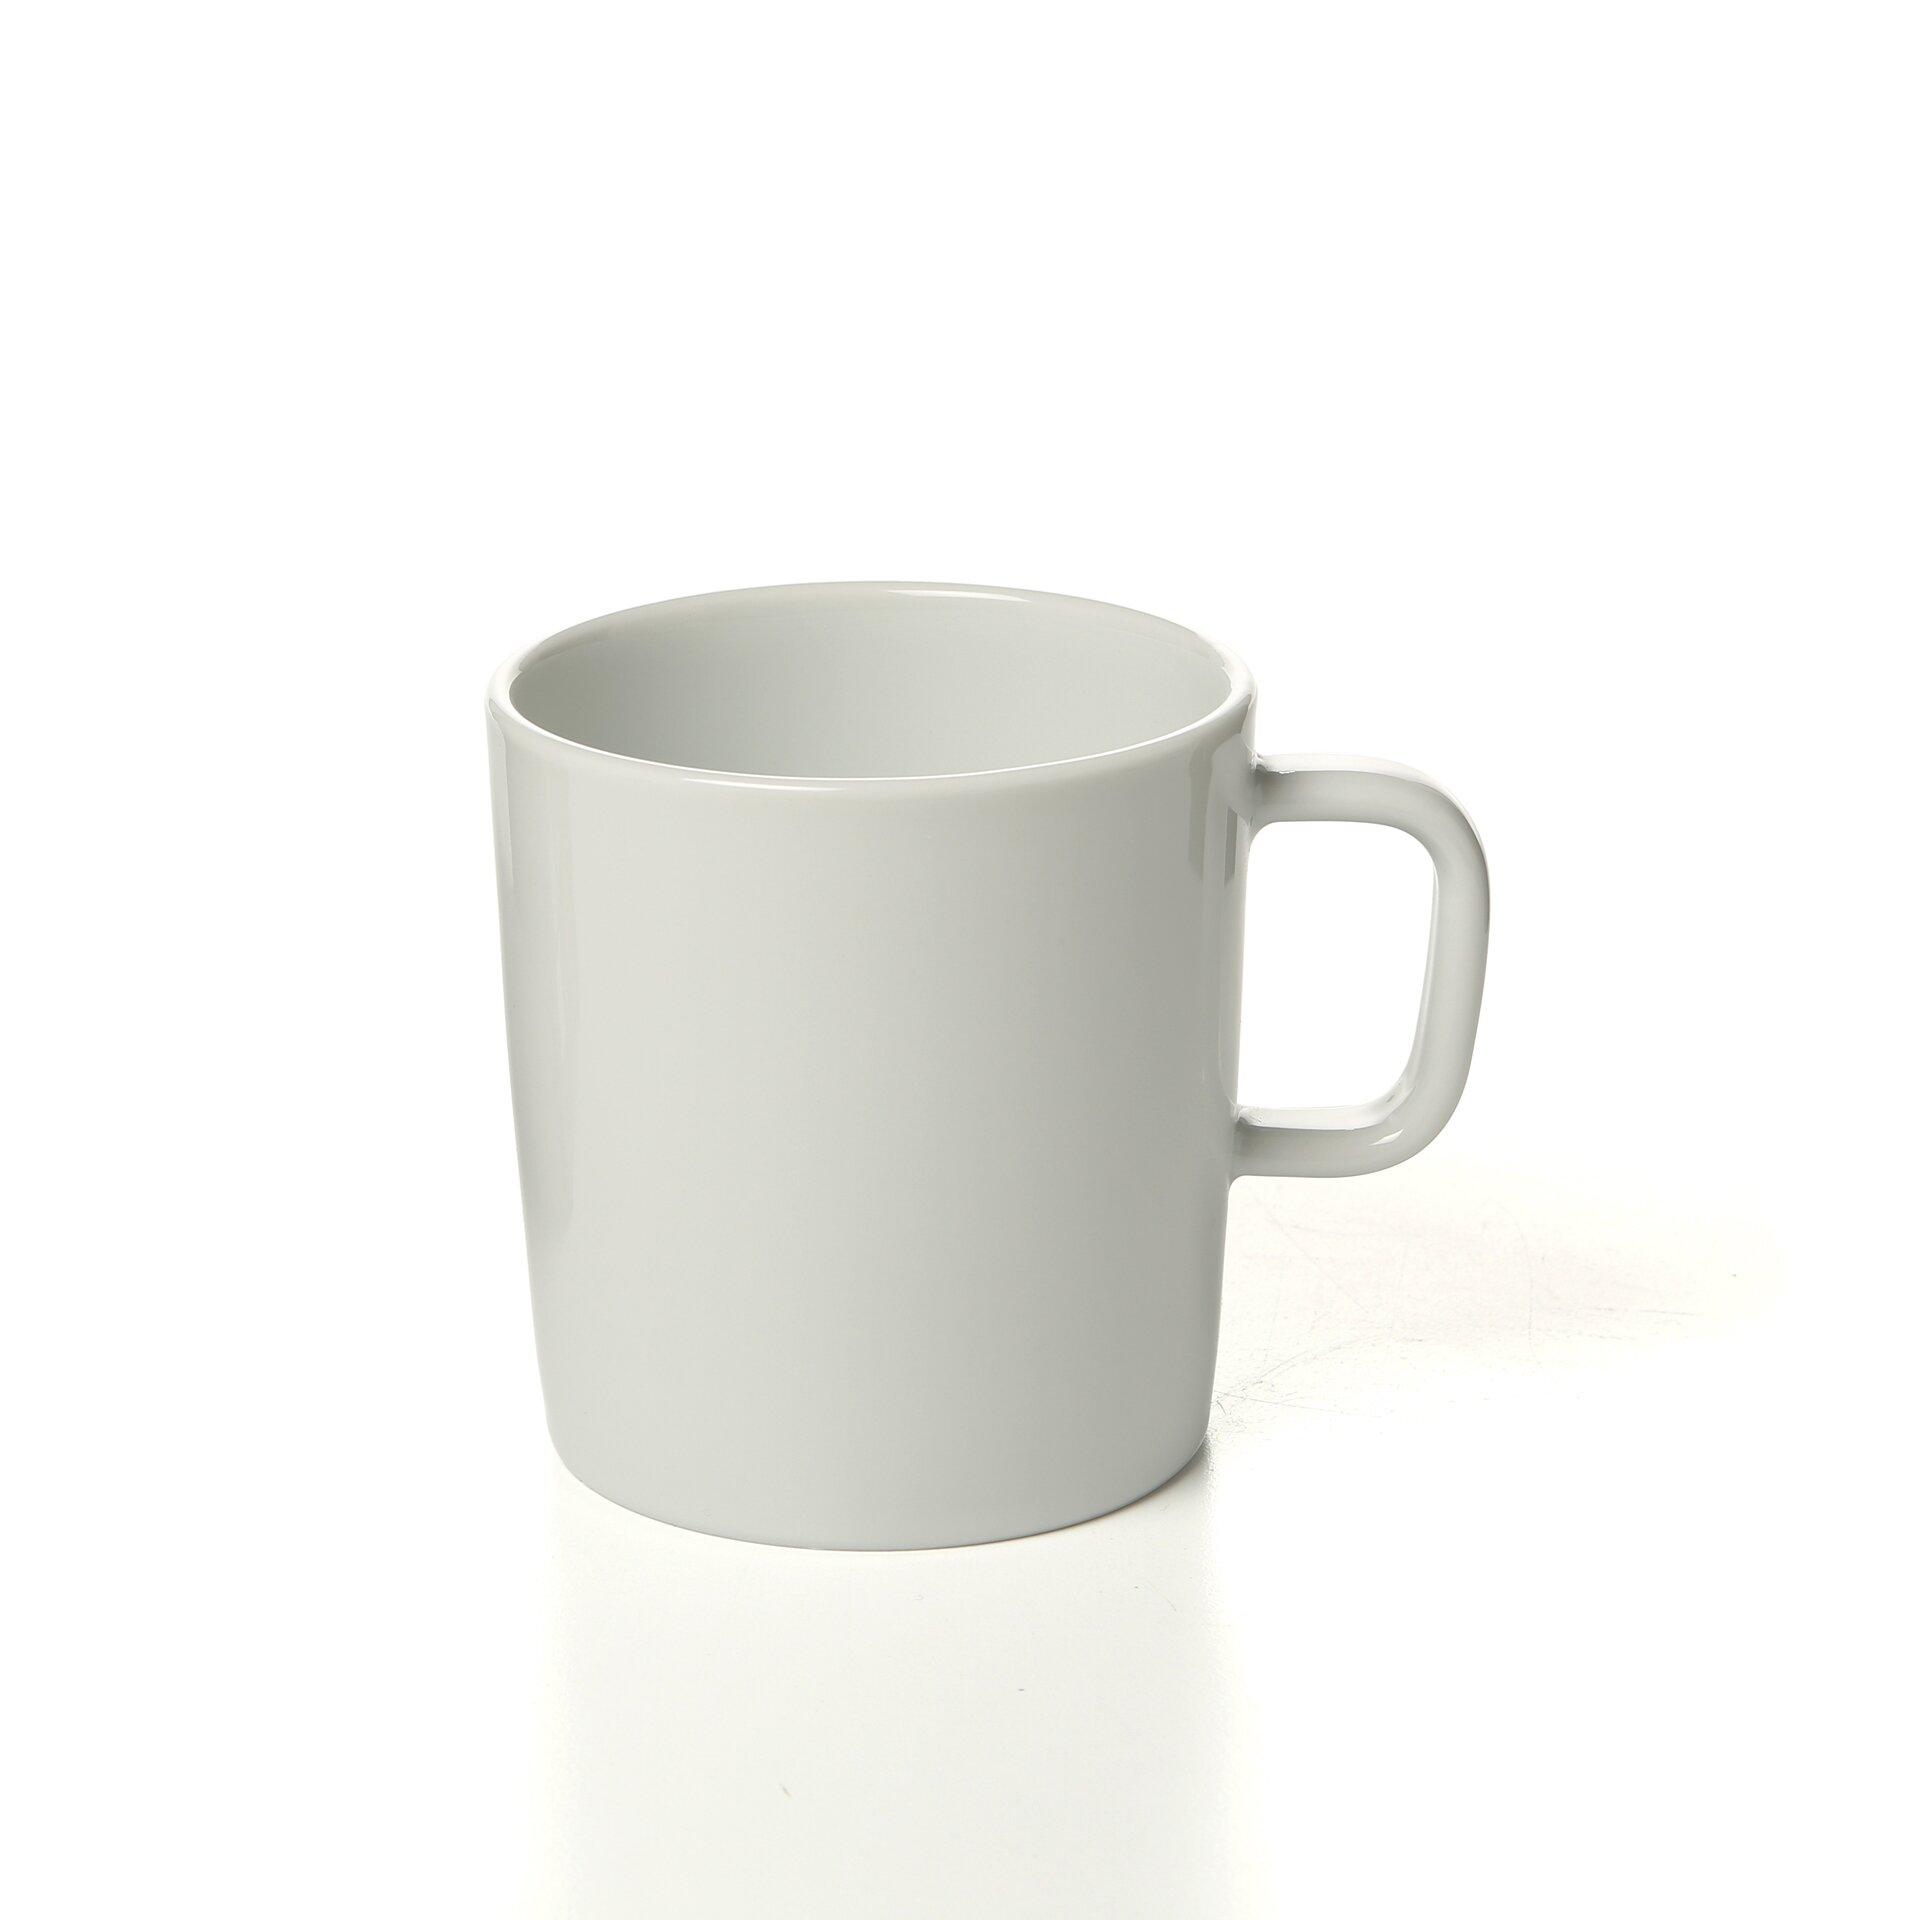 Platebowlcup Mug by Jasper Morrison & Reviews   AllModern - Alessi Platebowlcup Mug by Jasper Morrison